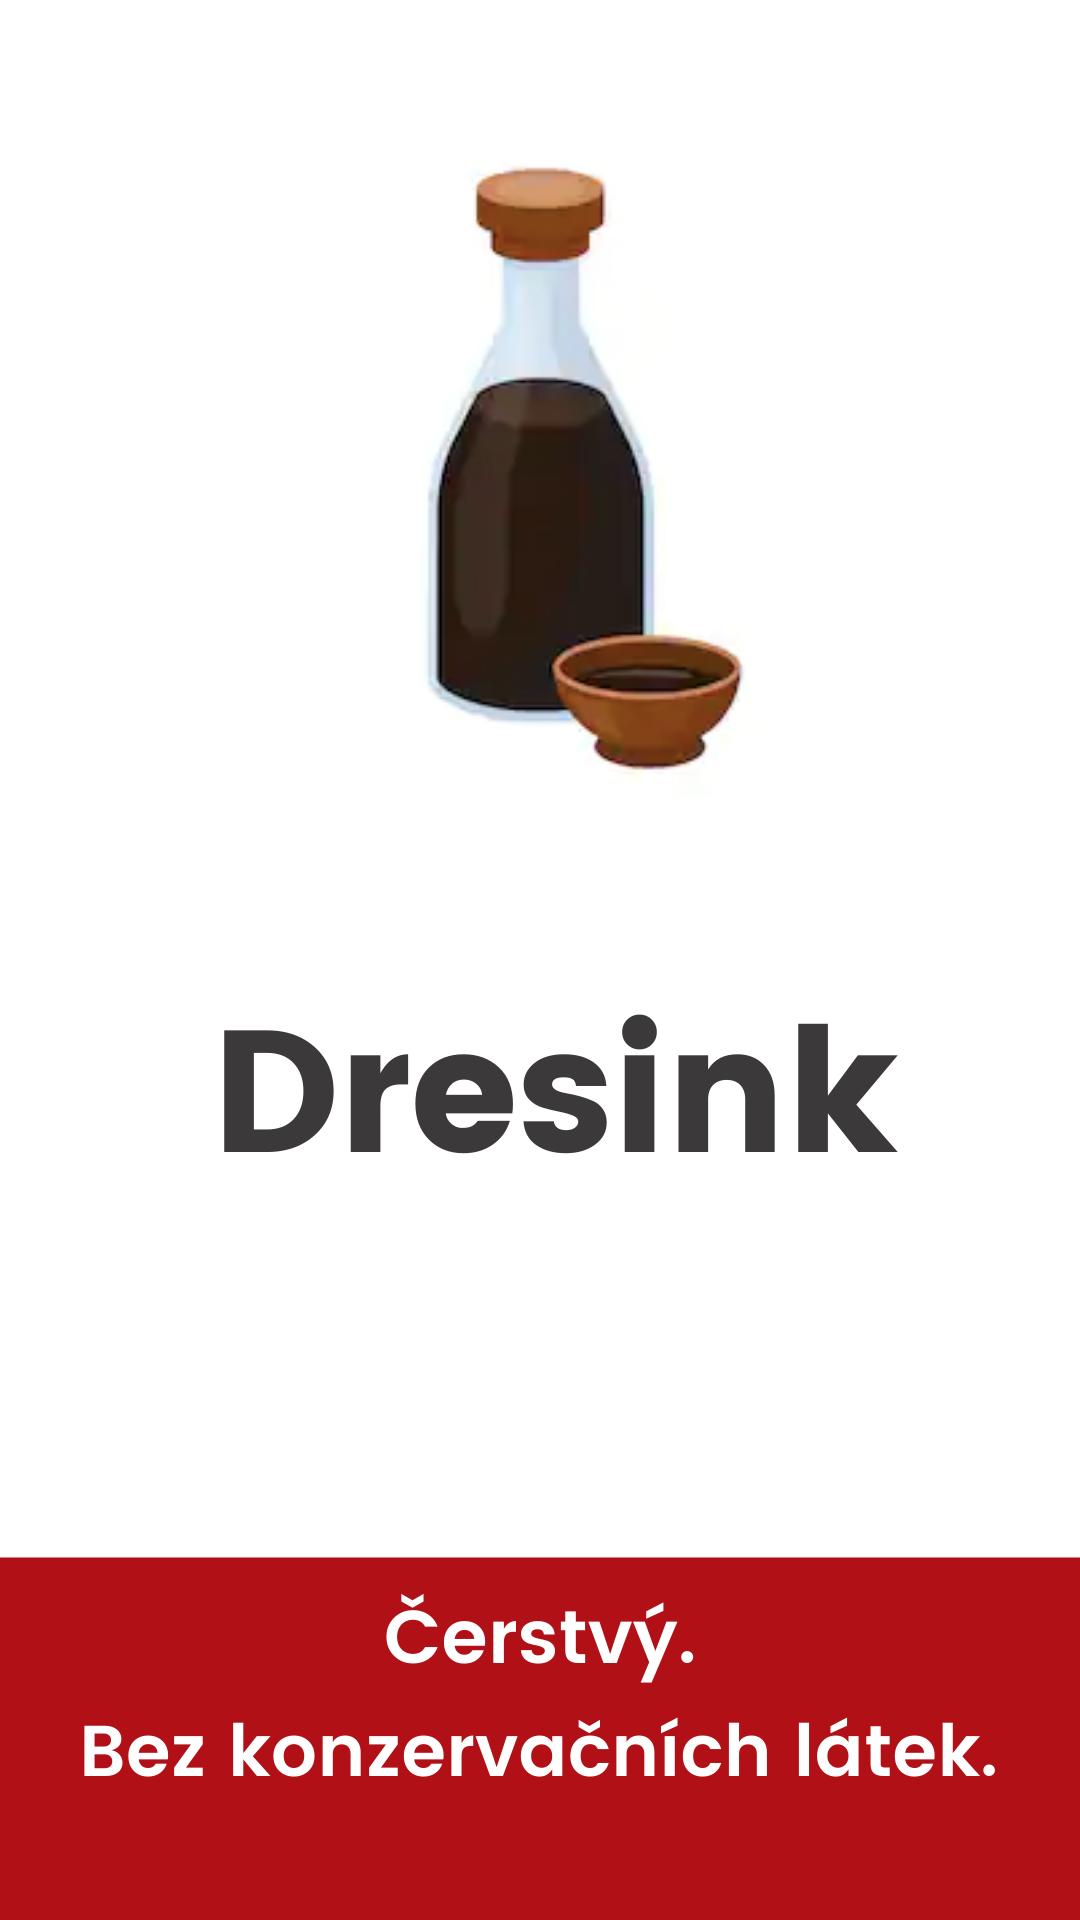 dresink icon (2)